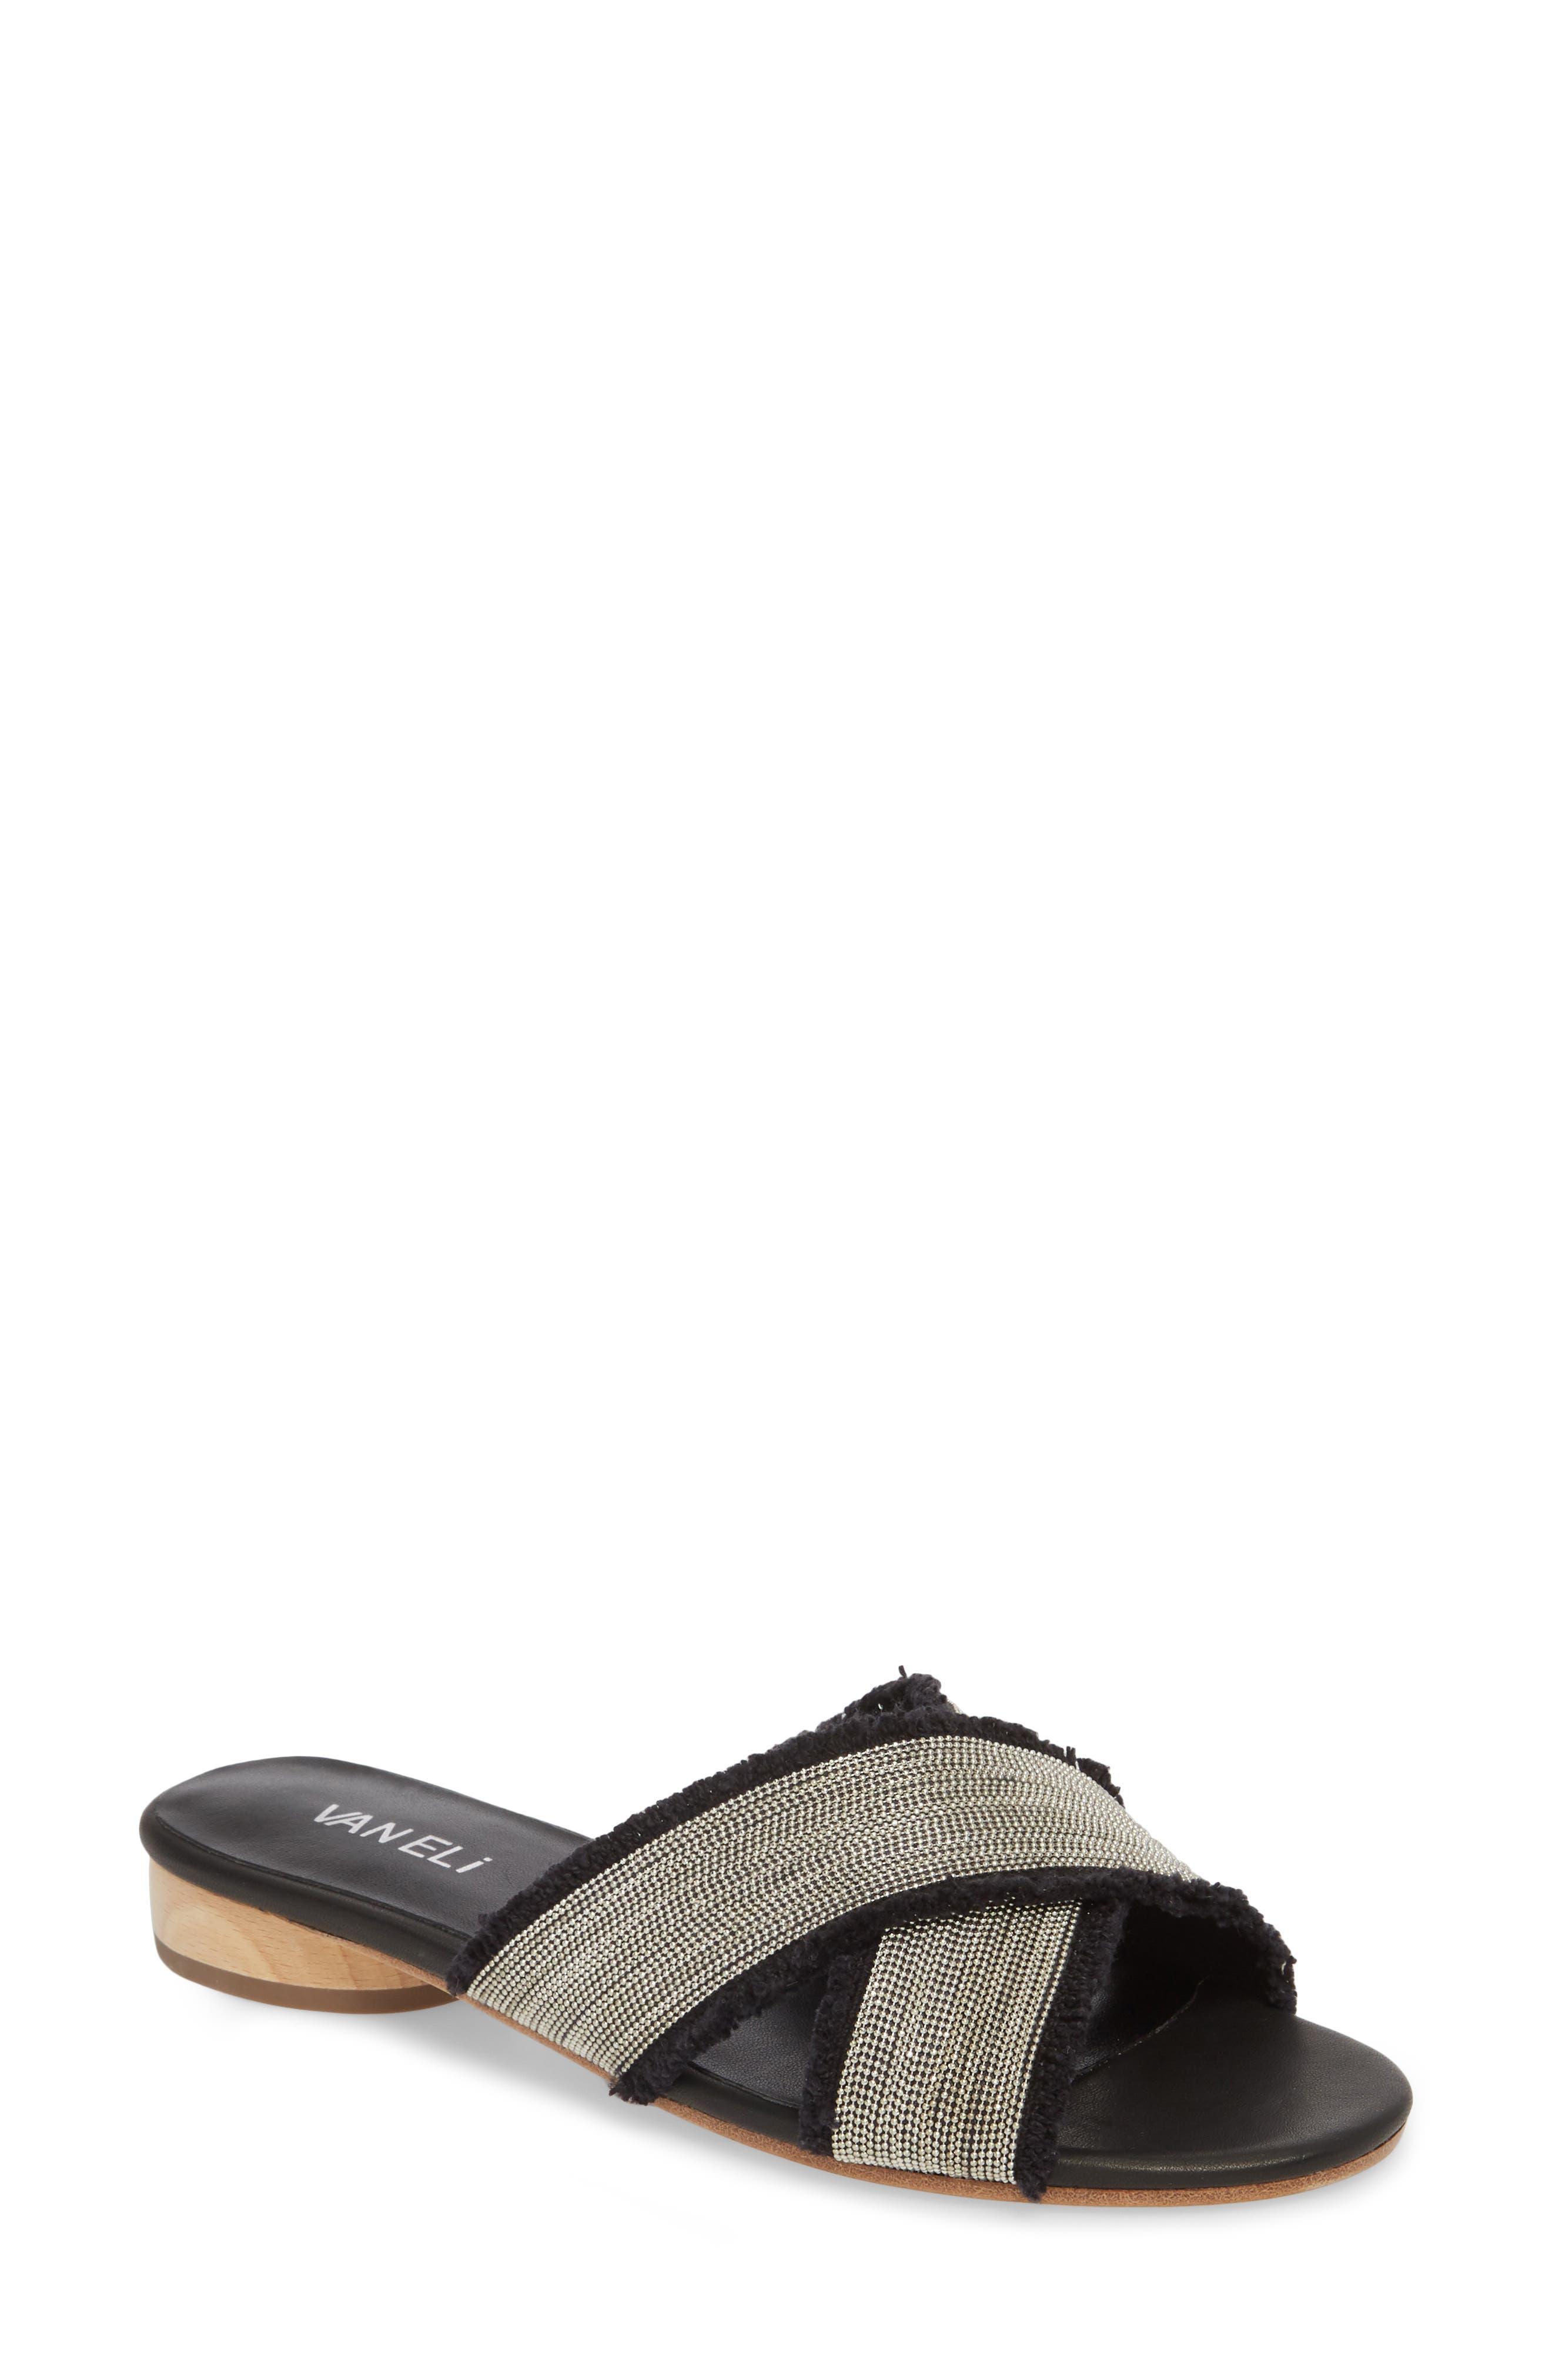 Baret Embellished Cross Strap Slide Sandal,                             Main thumbnail 1, color,                             BLACK FABRIC